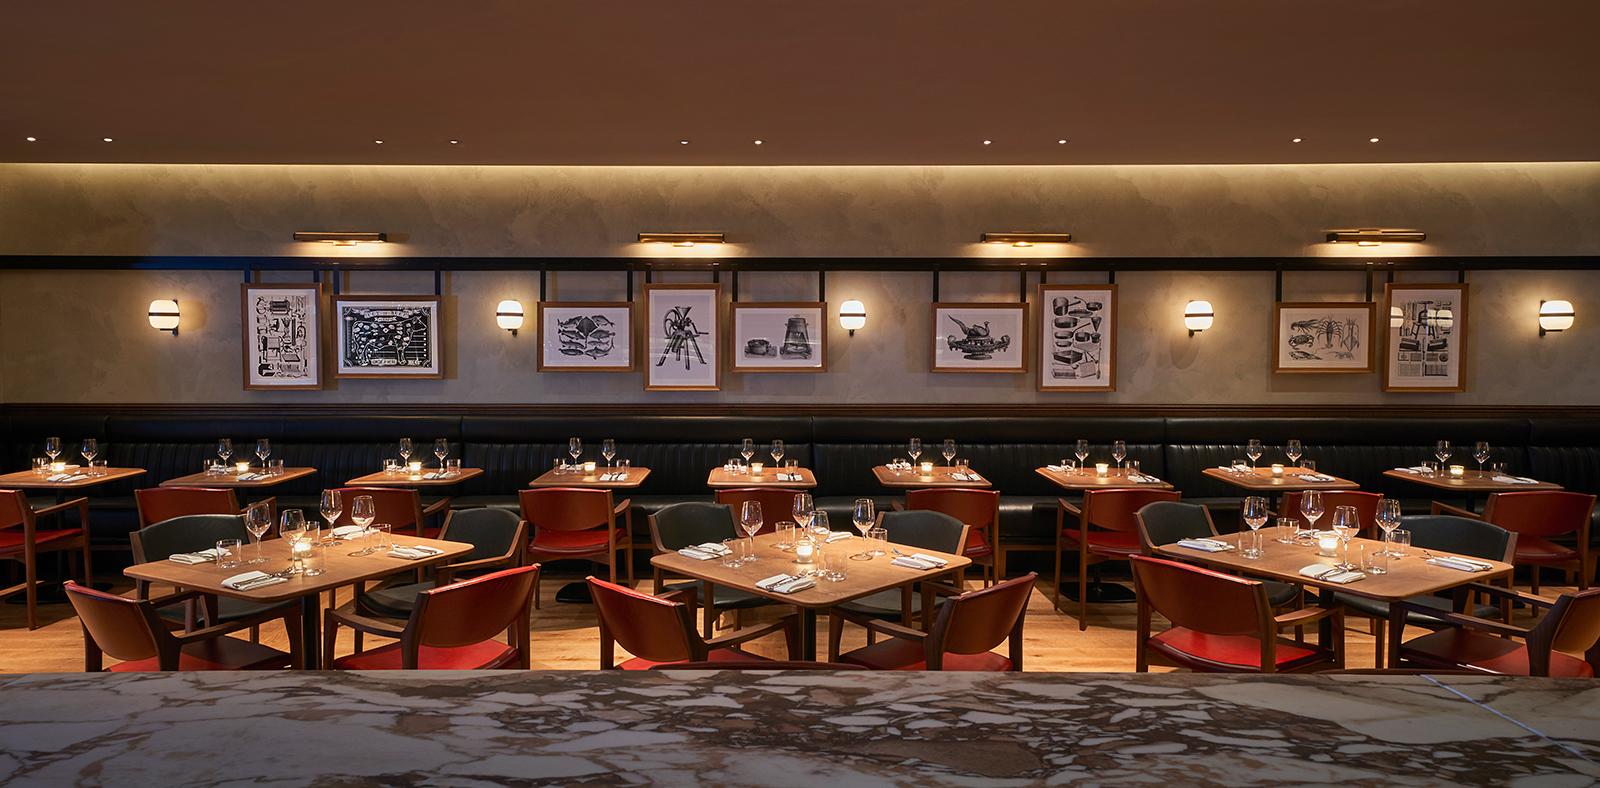 Gridiron bar interior in London